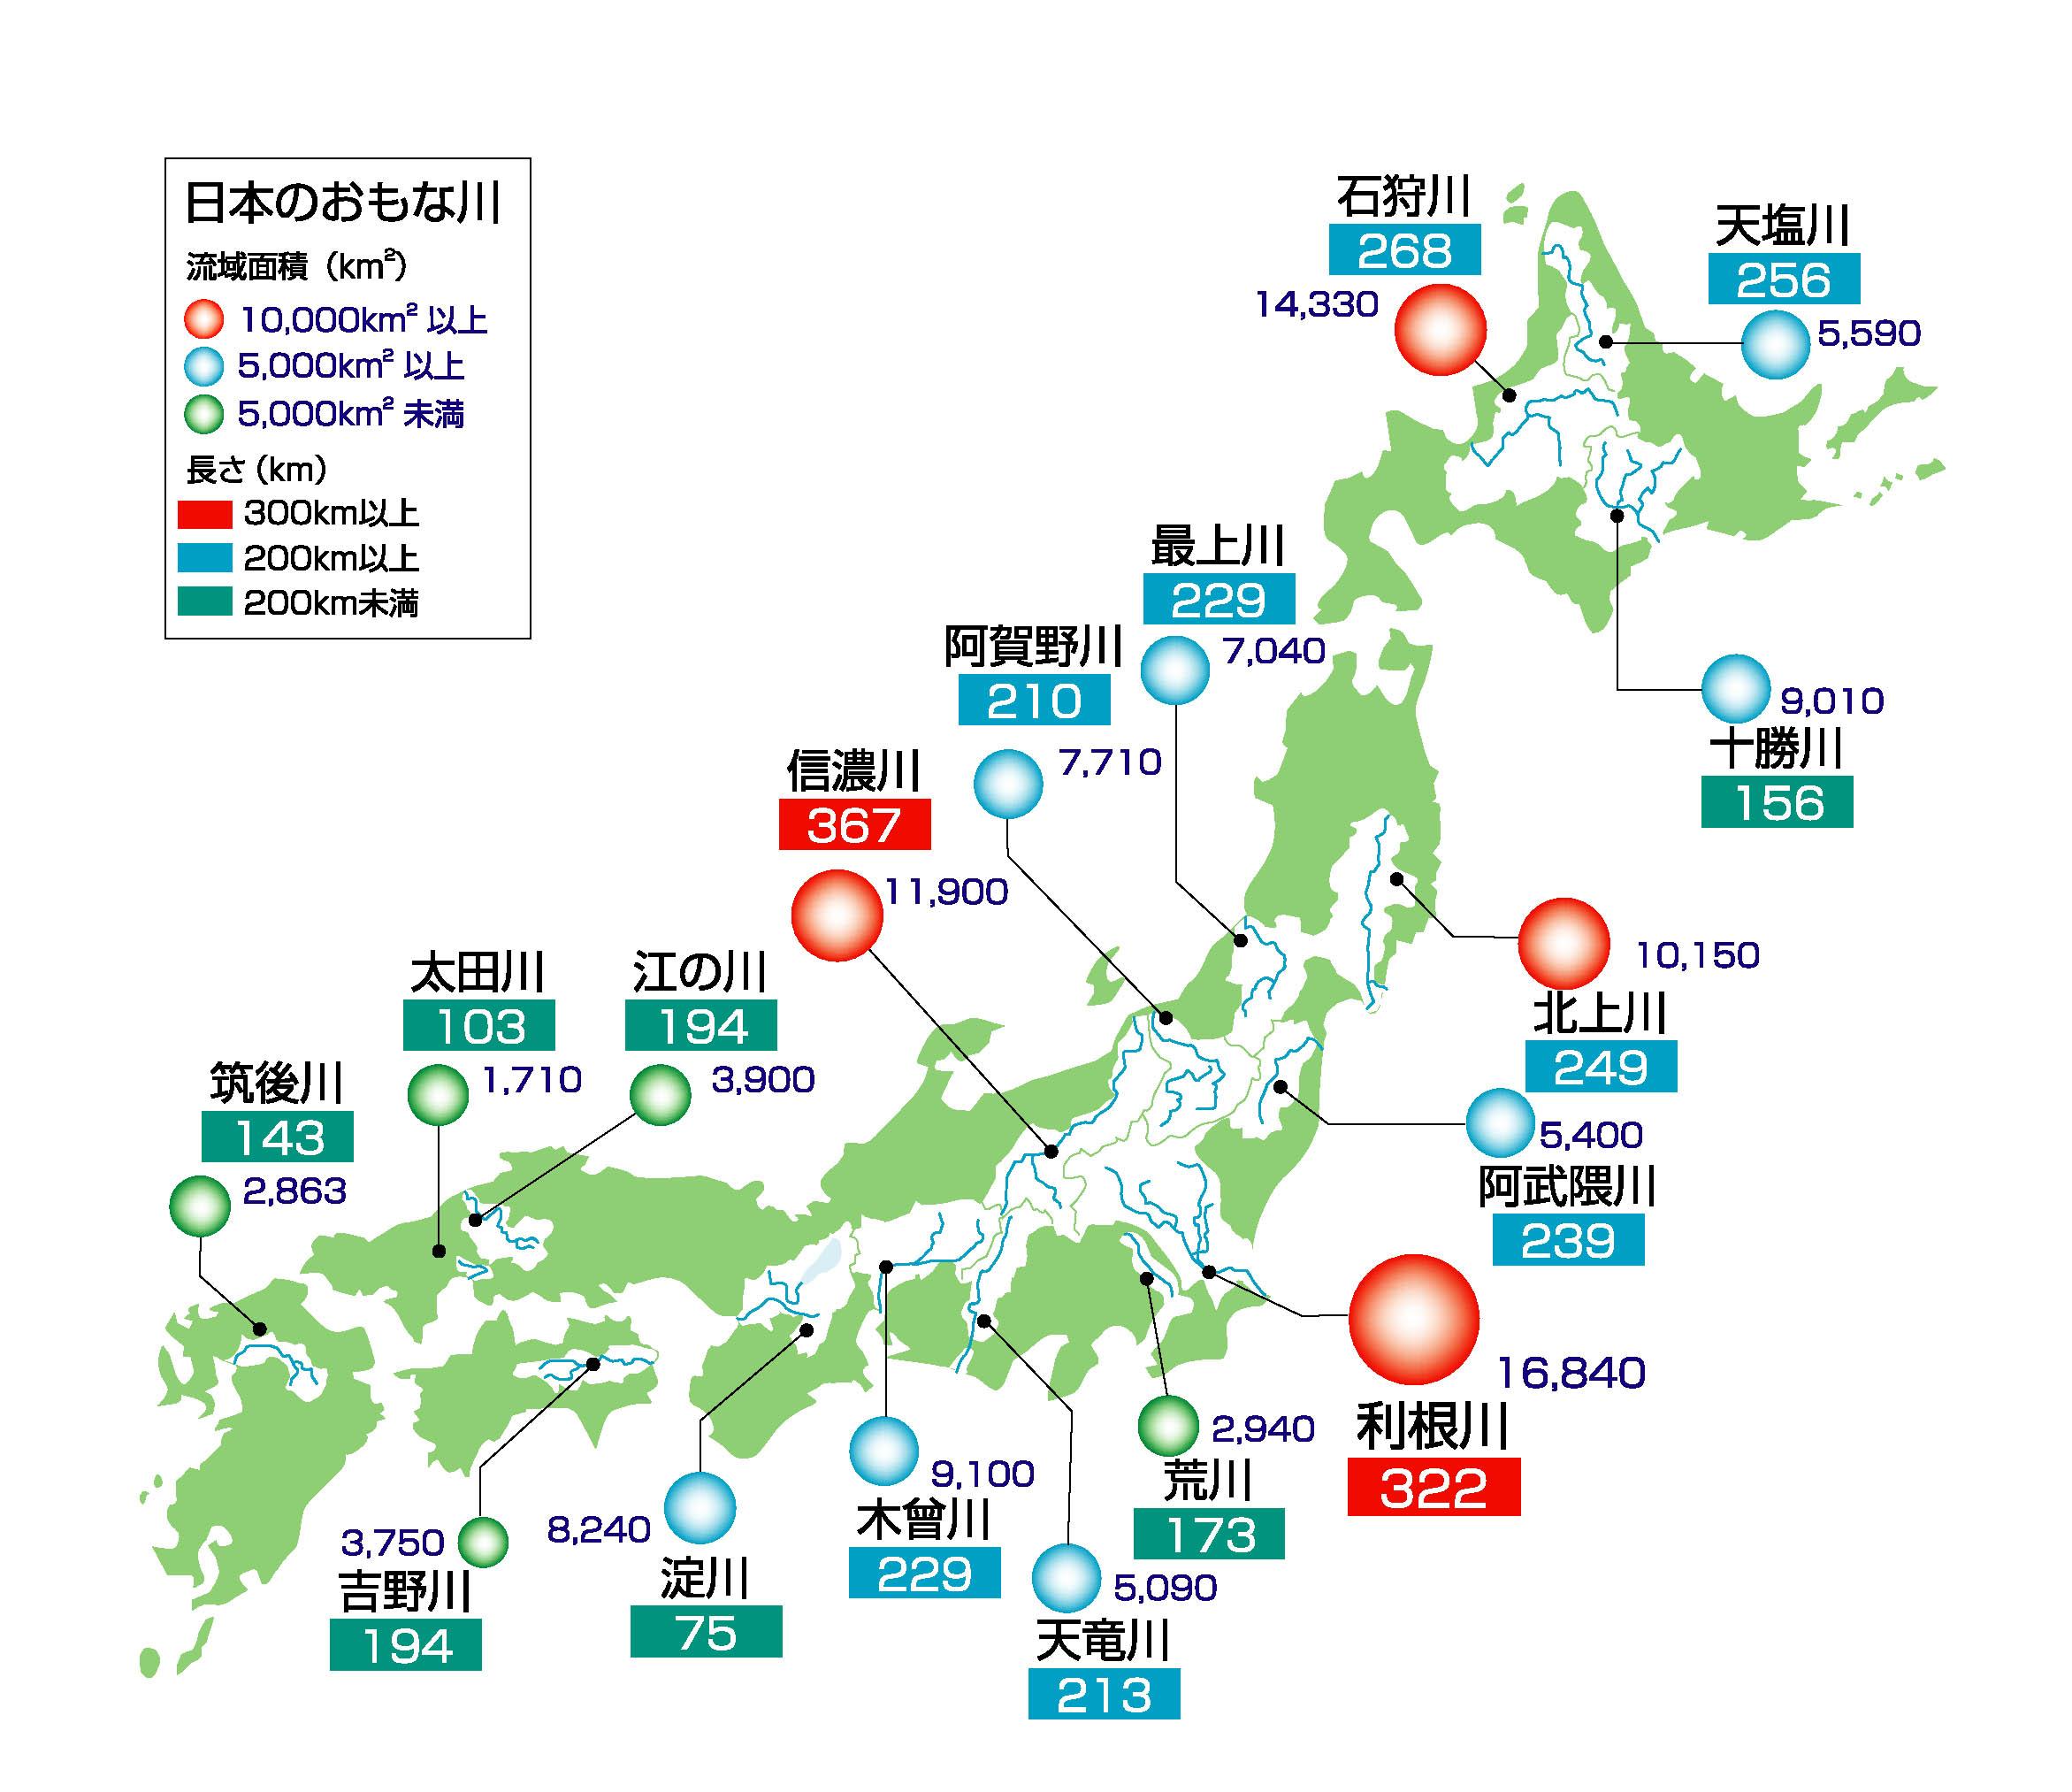 「日本の河川 地図」の画像検索結果